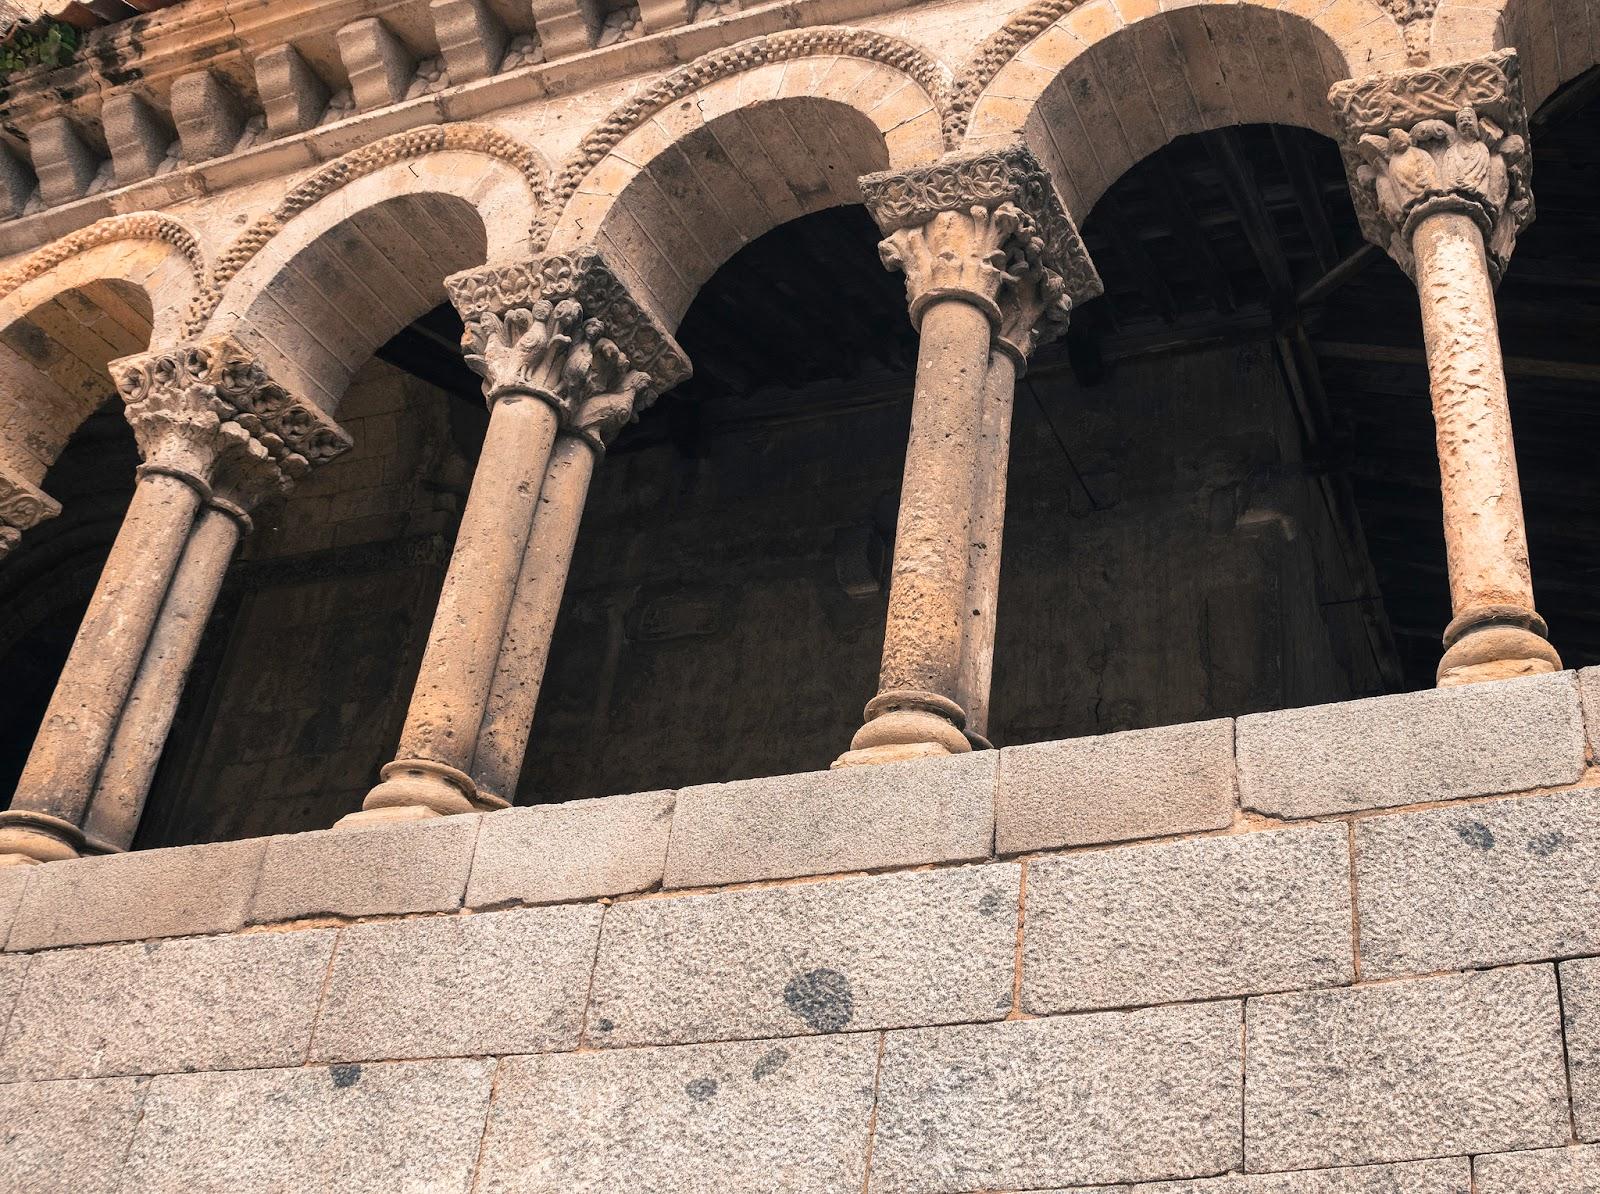 Iglesia de San Martin, Segovia 2015